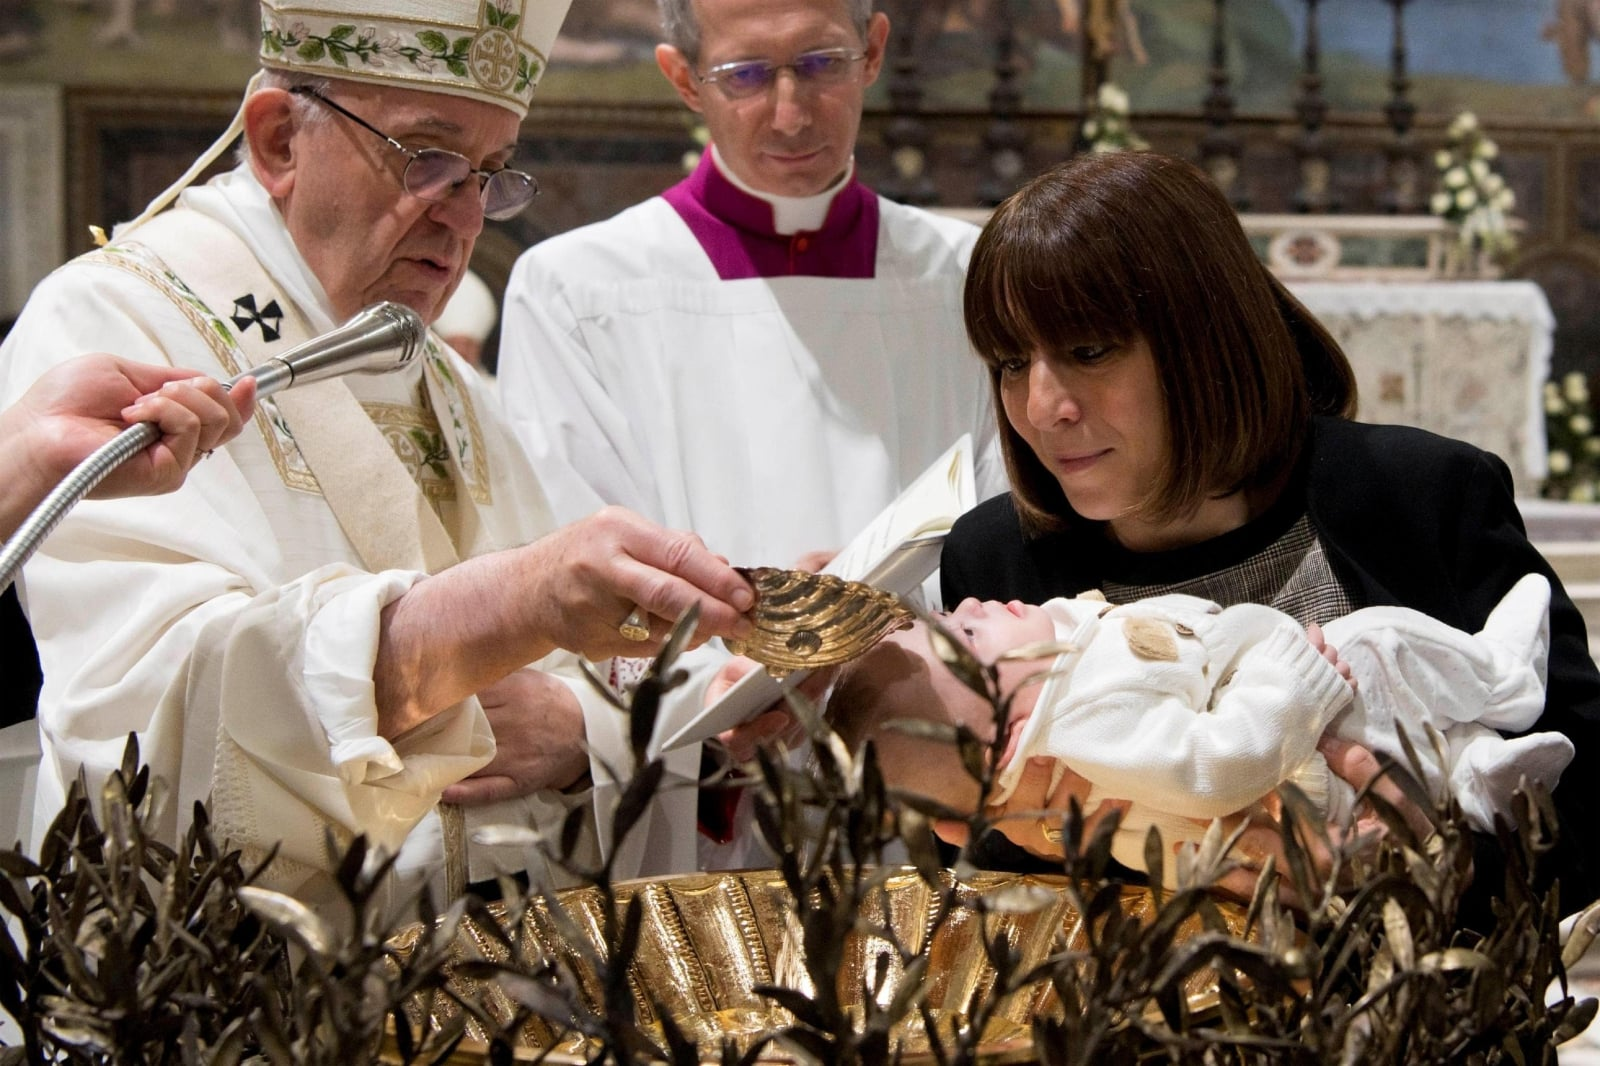 Papież Franciszek ochrzcił 34 dzieci EPA/OSSERVATORE ROMANO